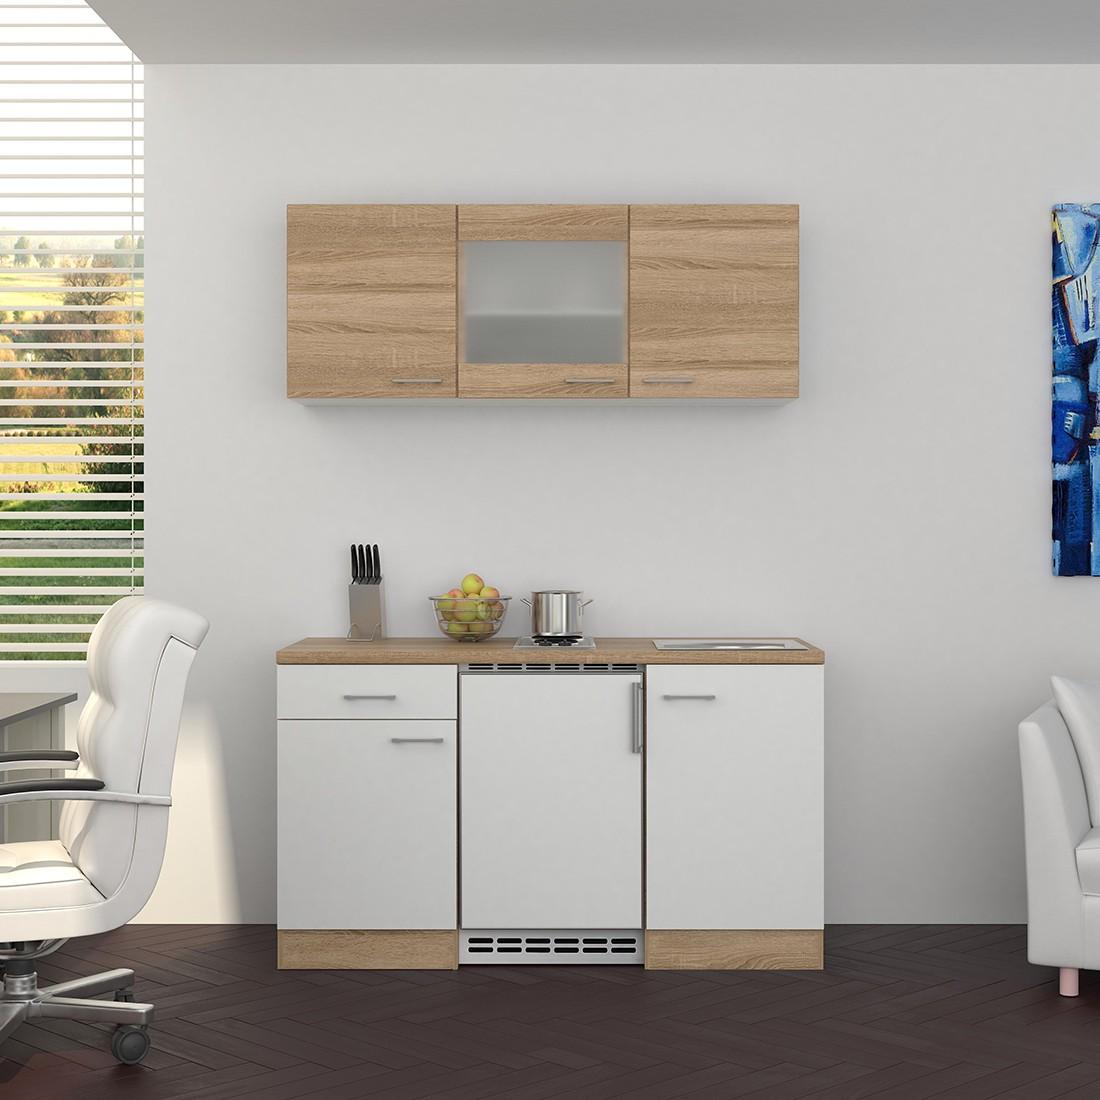 singlek che venedig 9 teilig 1 glash nger breite 150 cm wei k che singlek chen. Black Bedroom Furniture Sets. Home Design Ideas